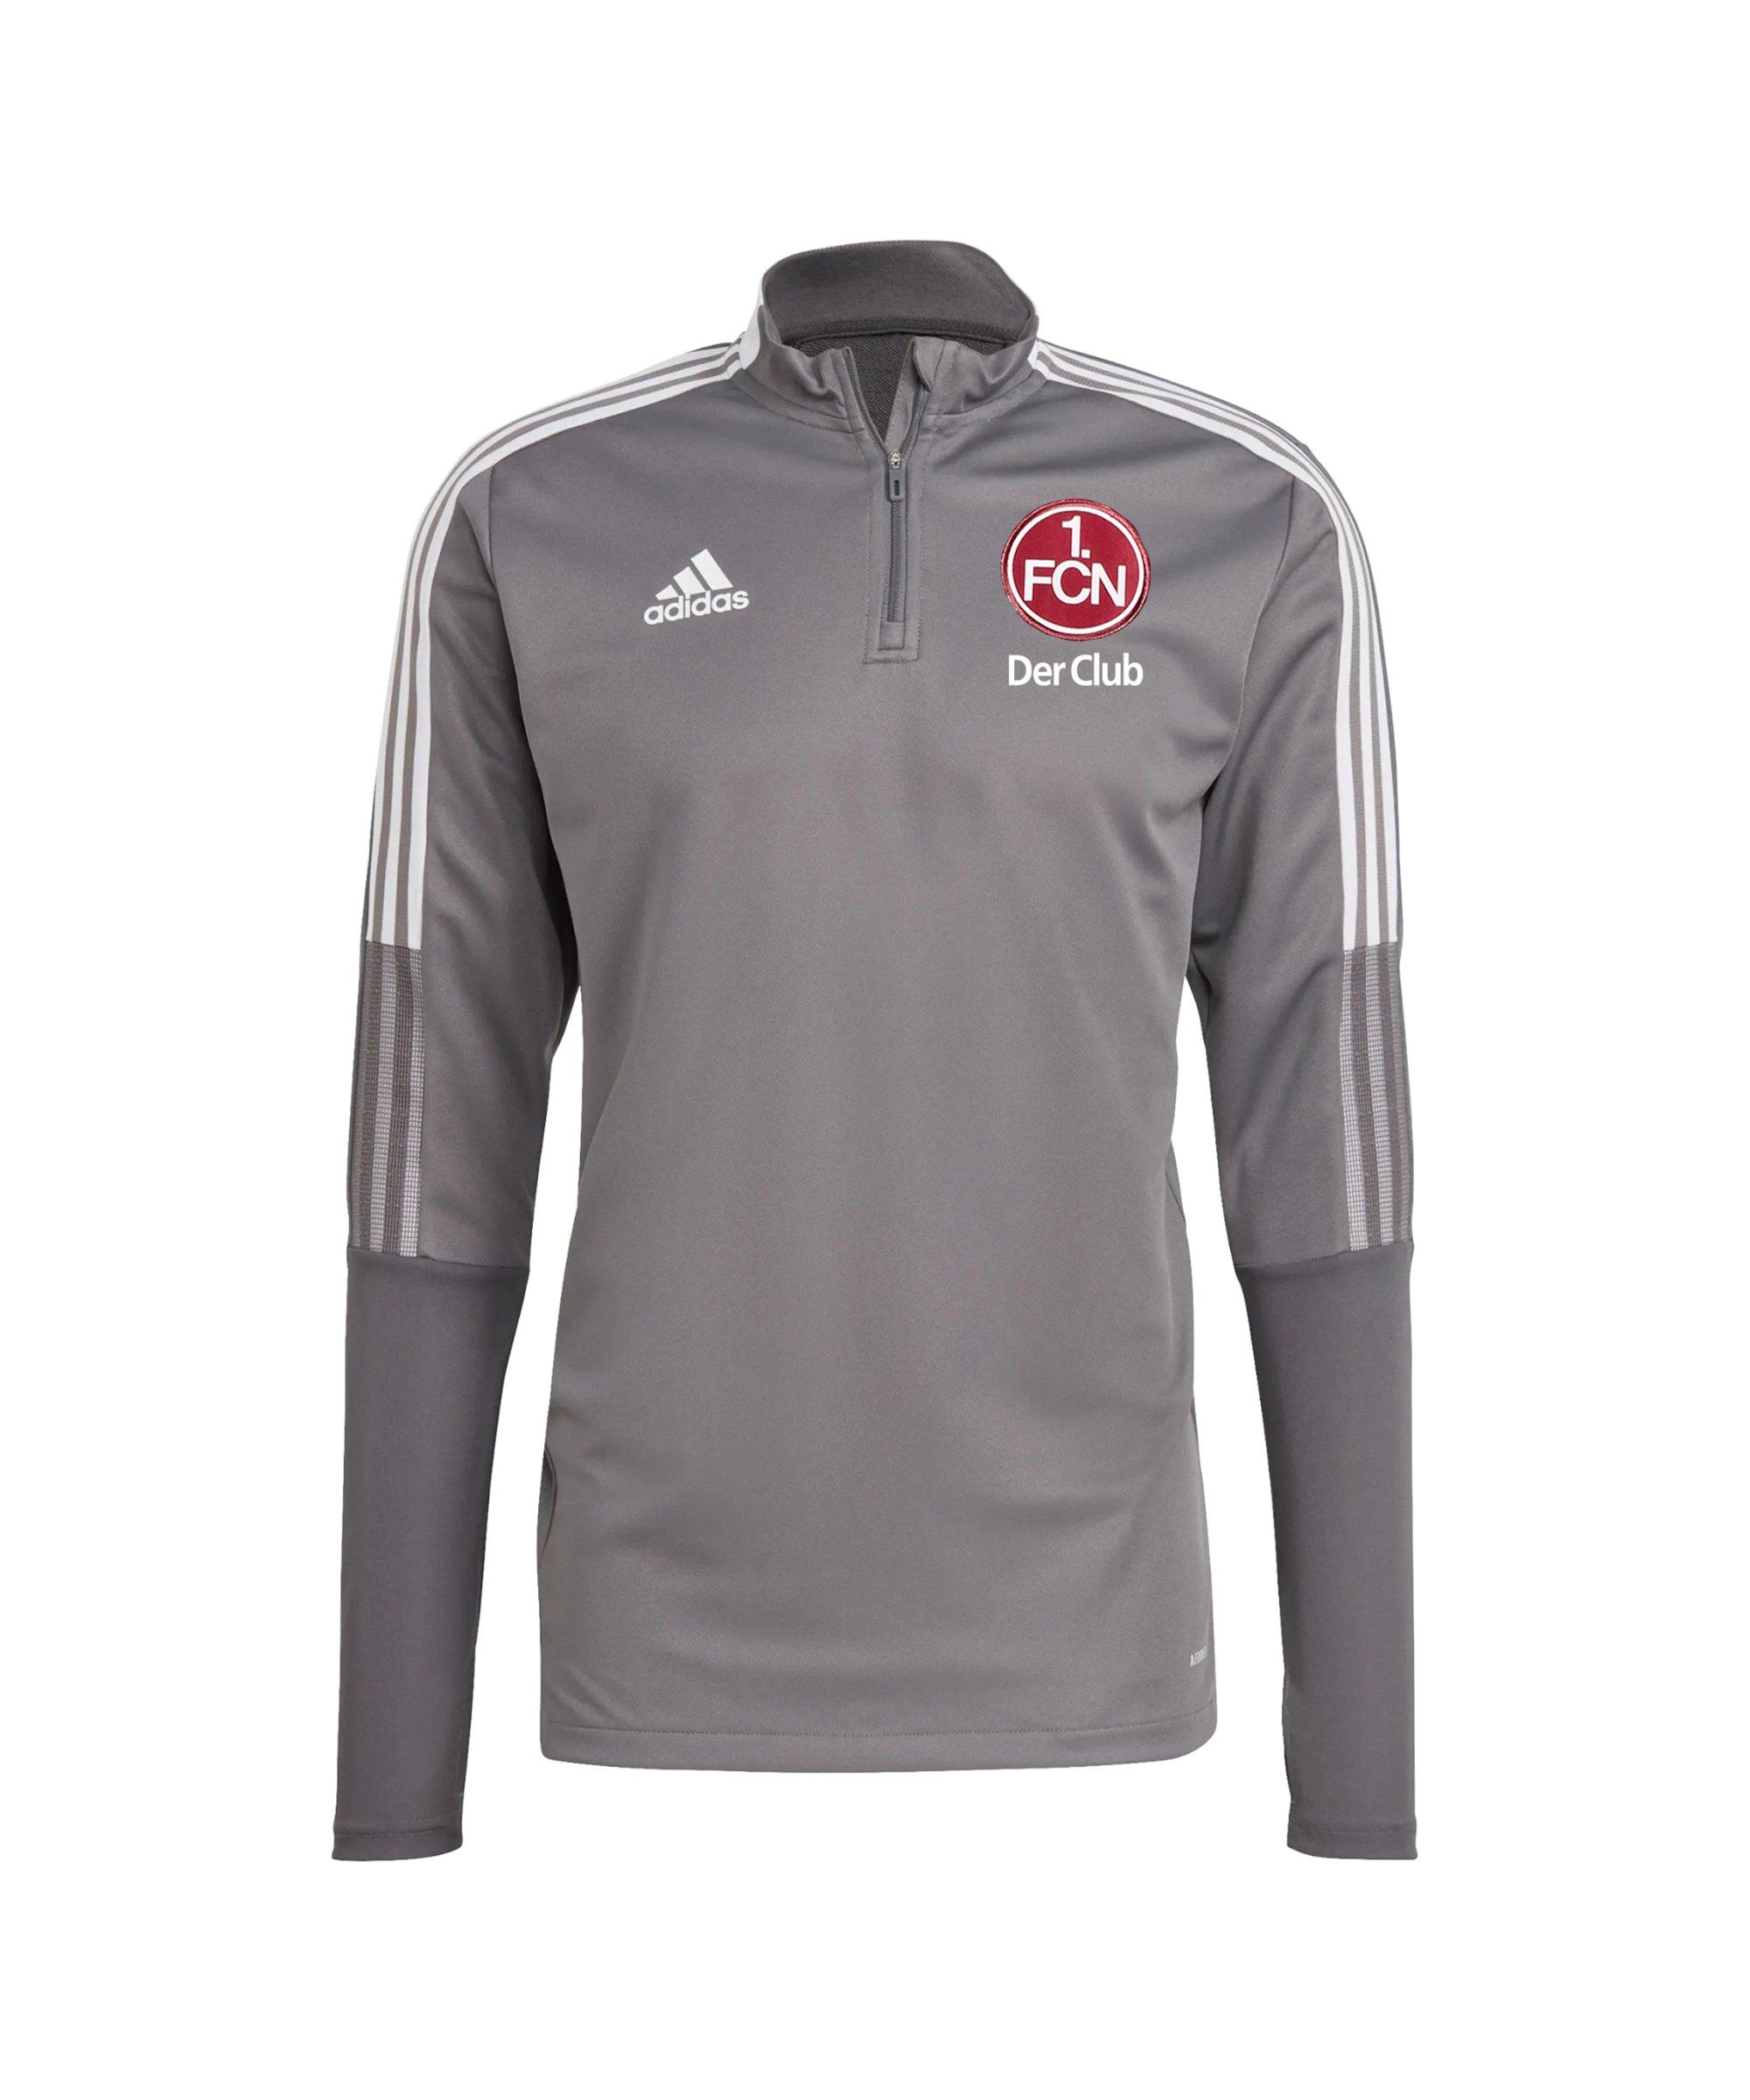 adidas 1. FC Nürnberg Trainingstop Grau - grau